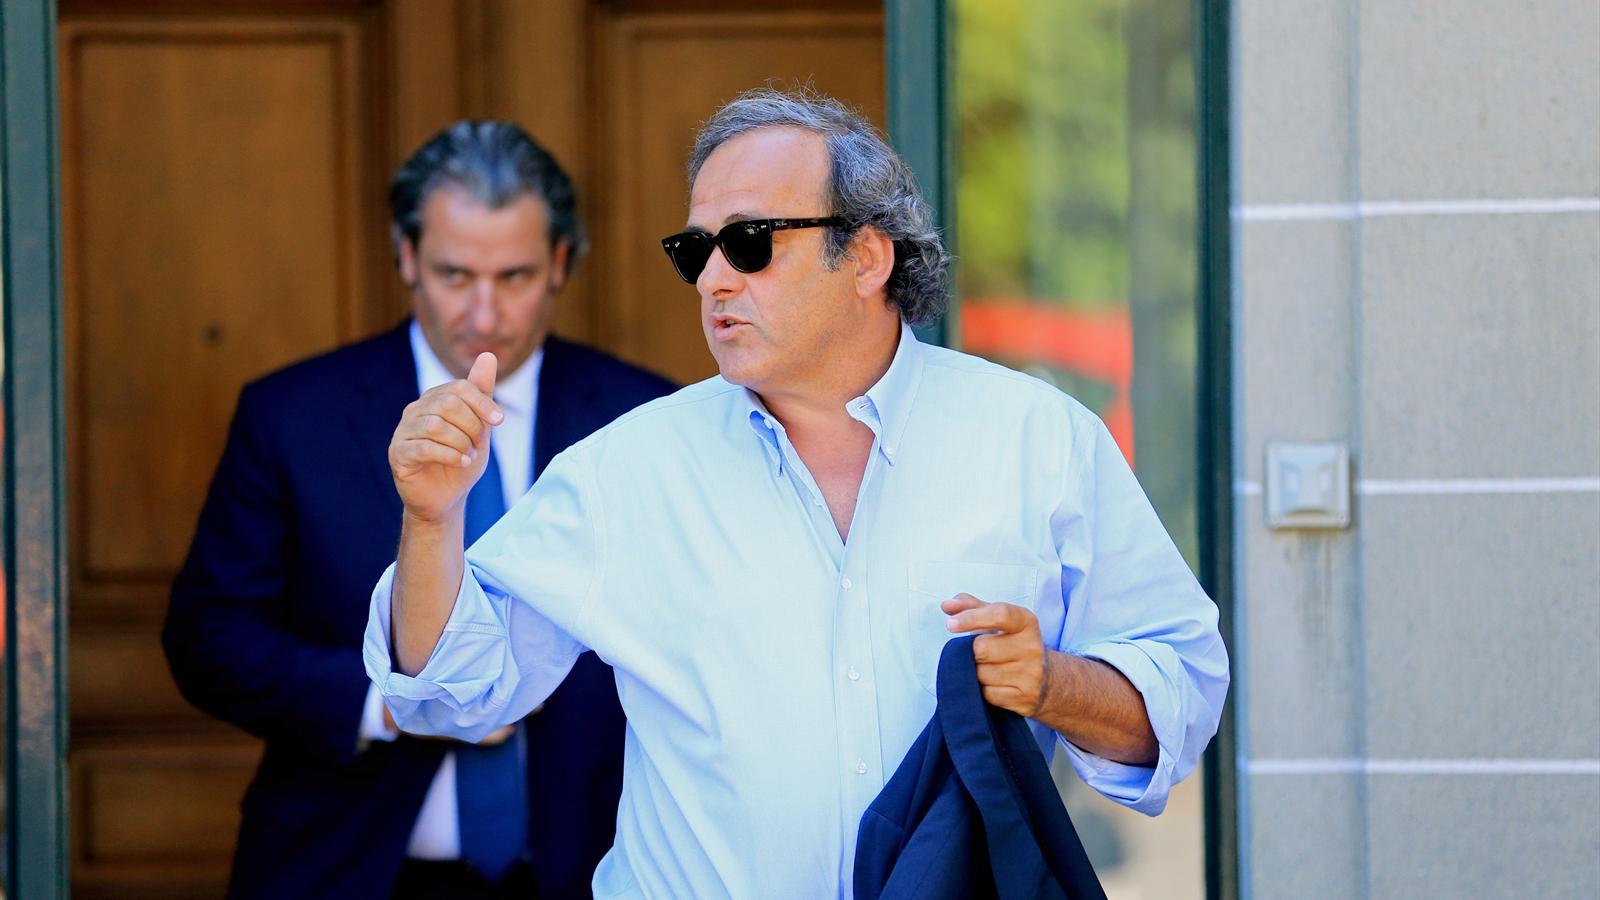 FIFA'dan Platini'ye vize